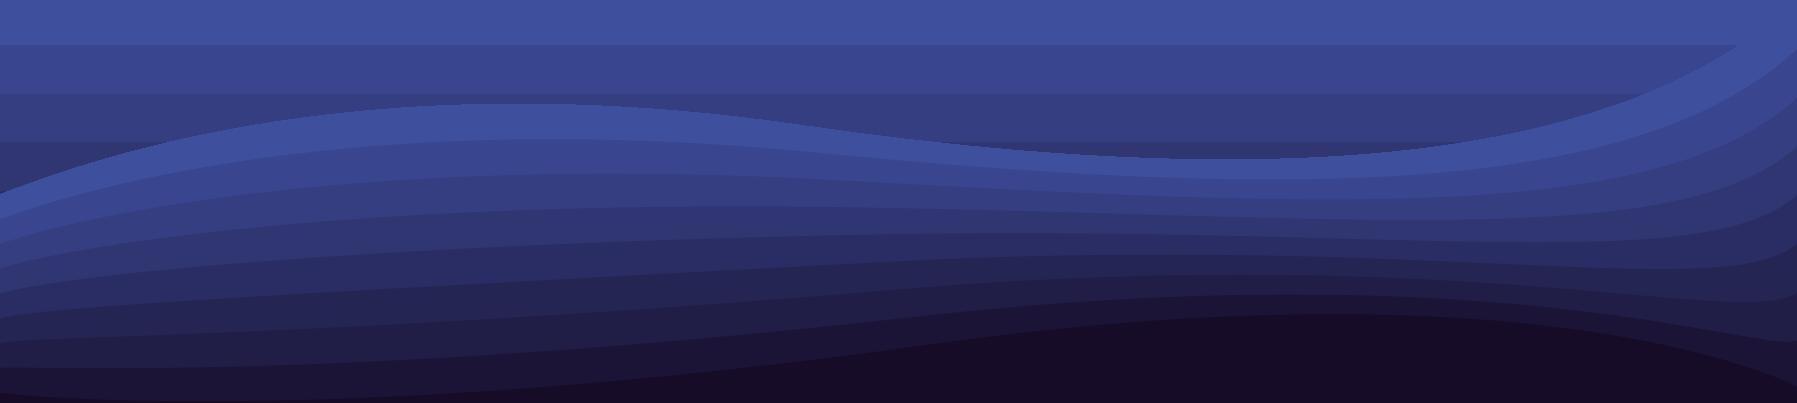 horizontal_curve.png